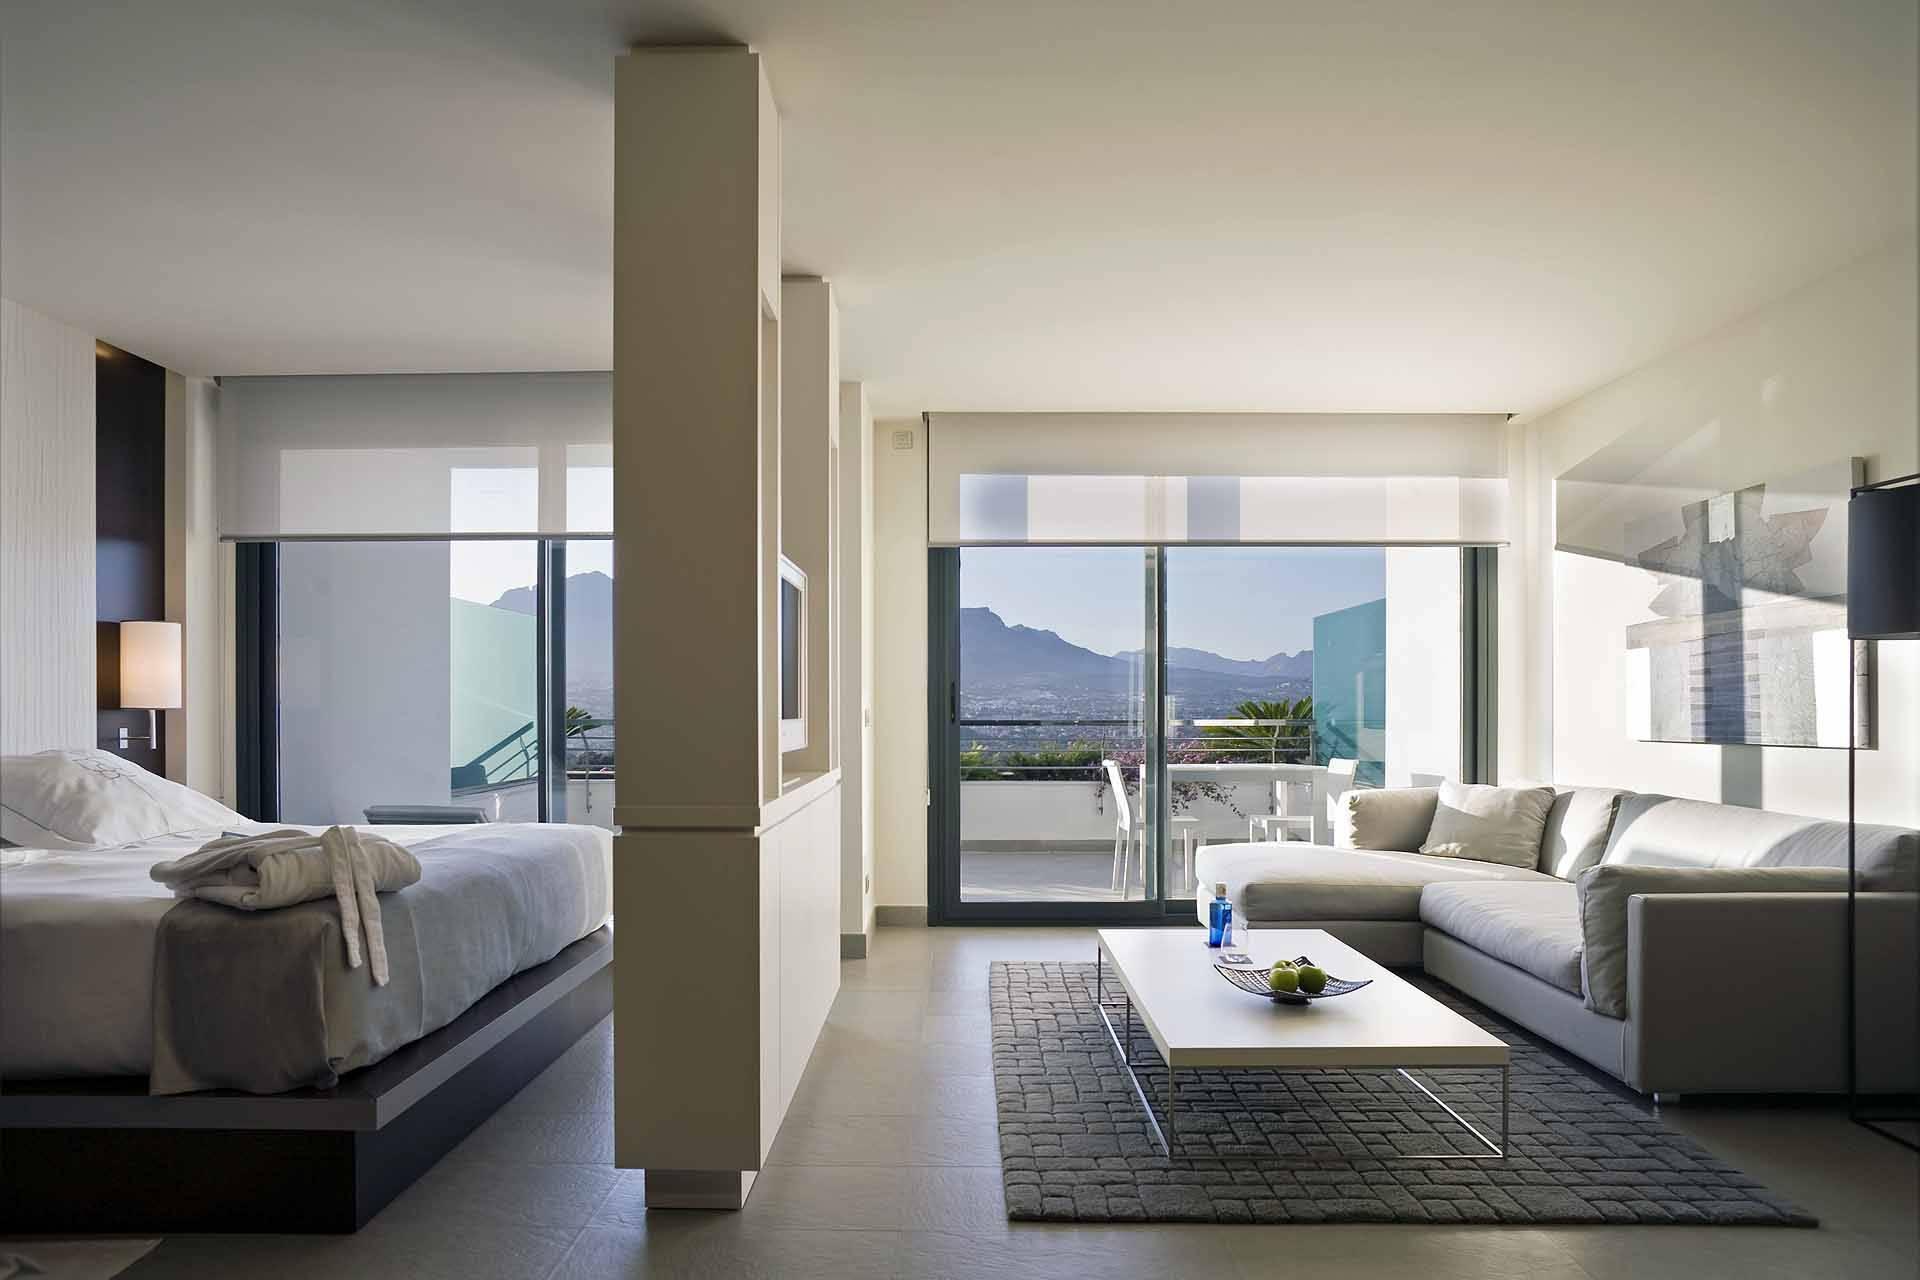 Sha Wellness Deluxe Suite Sejour AlicanteJPG